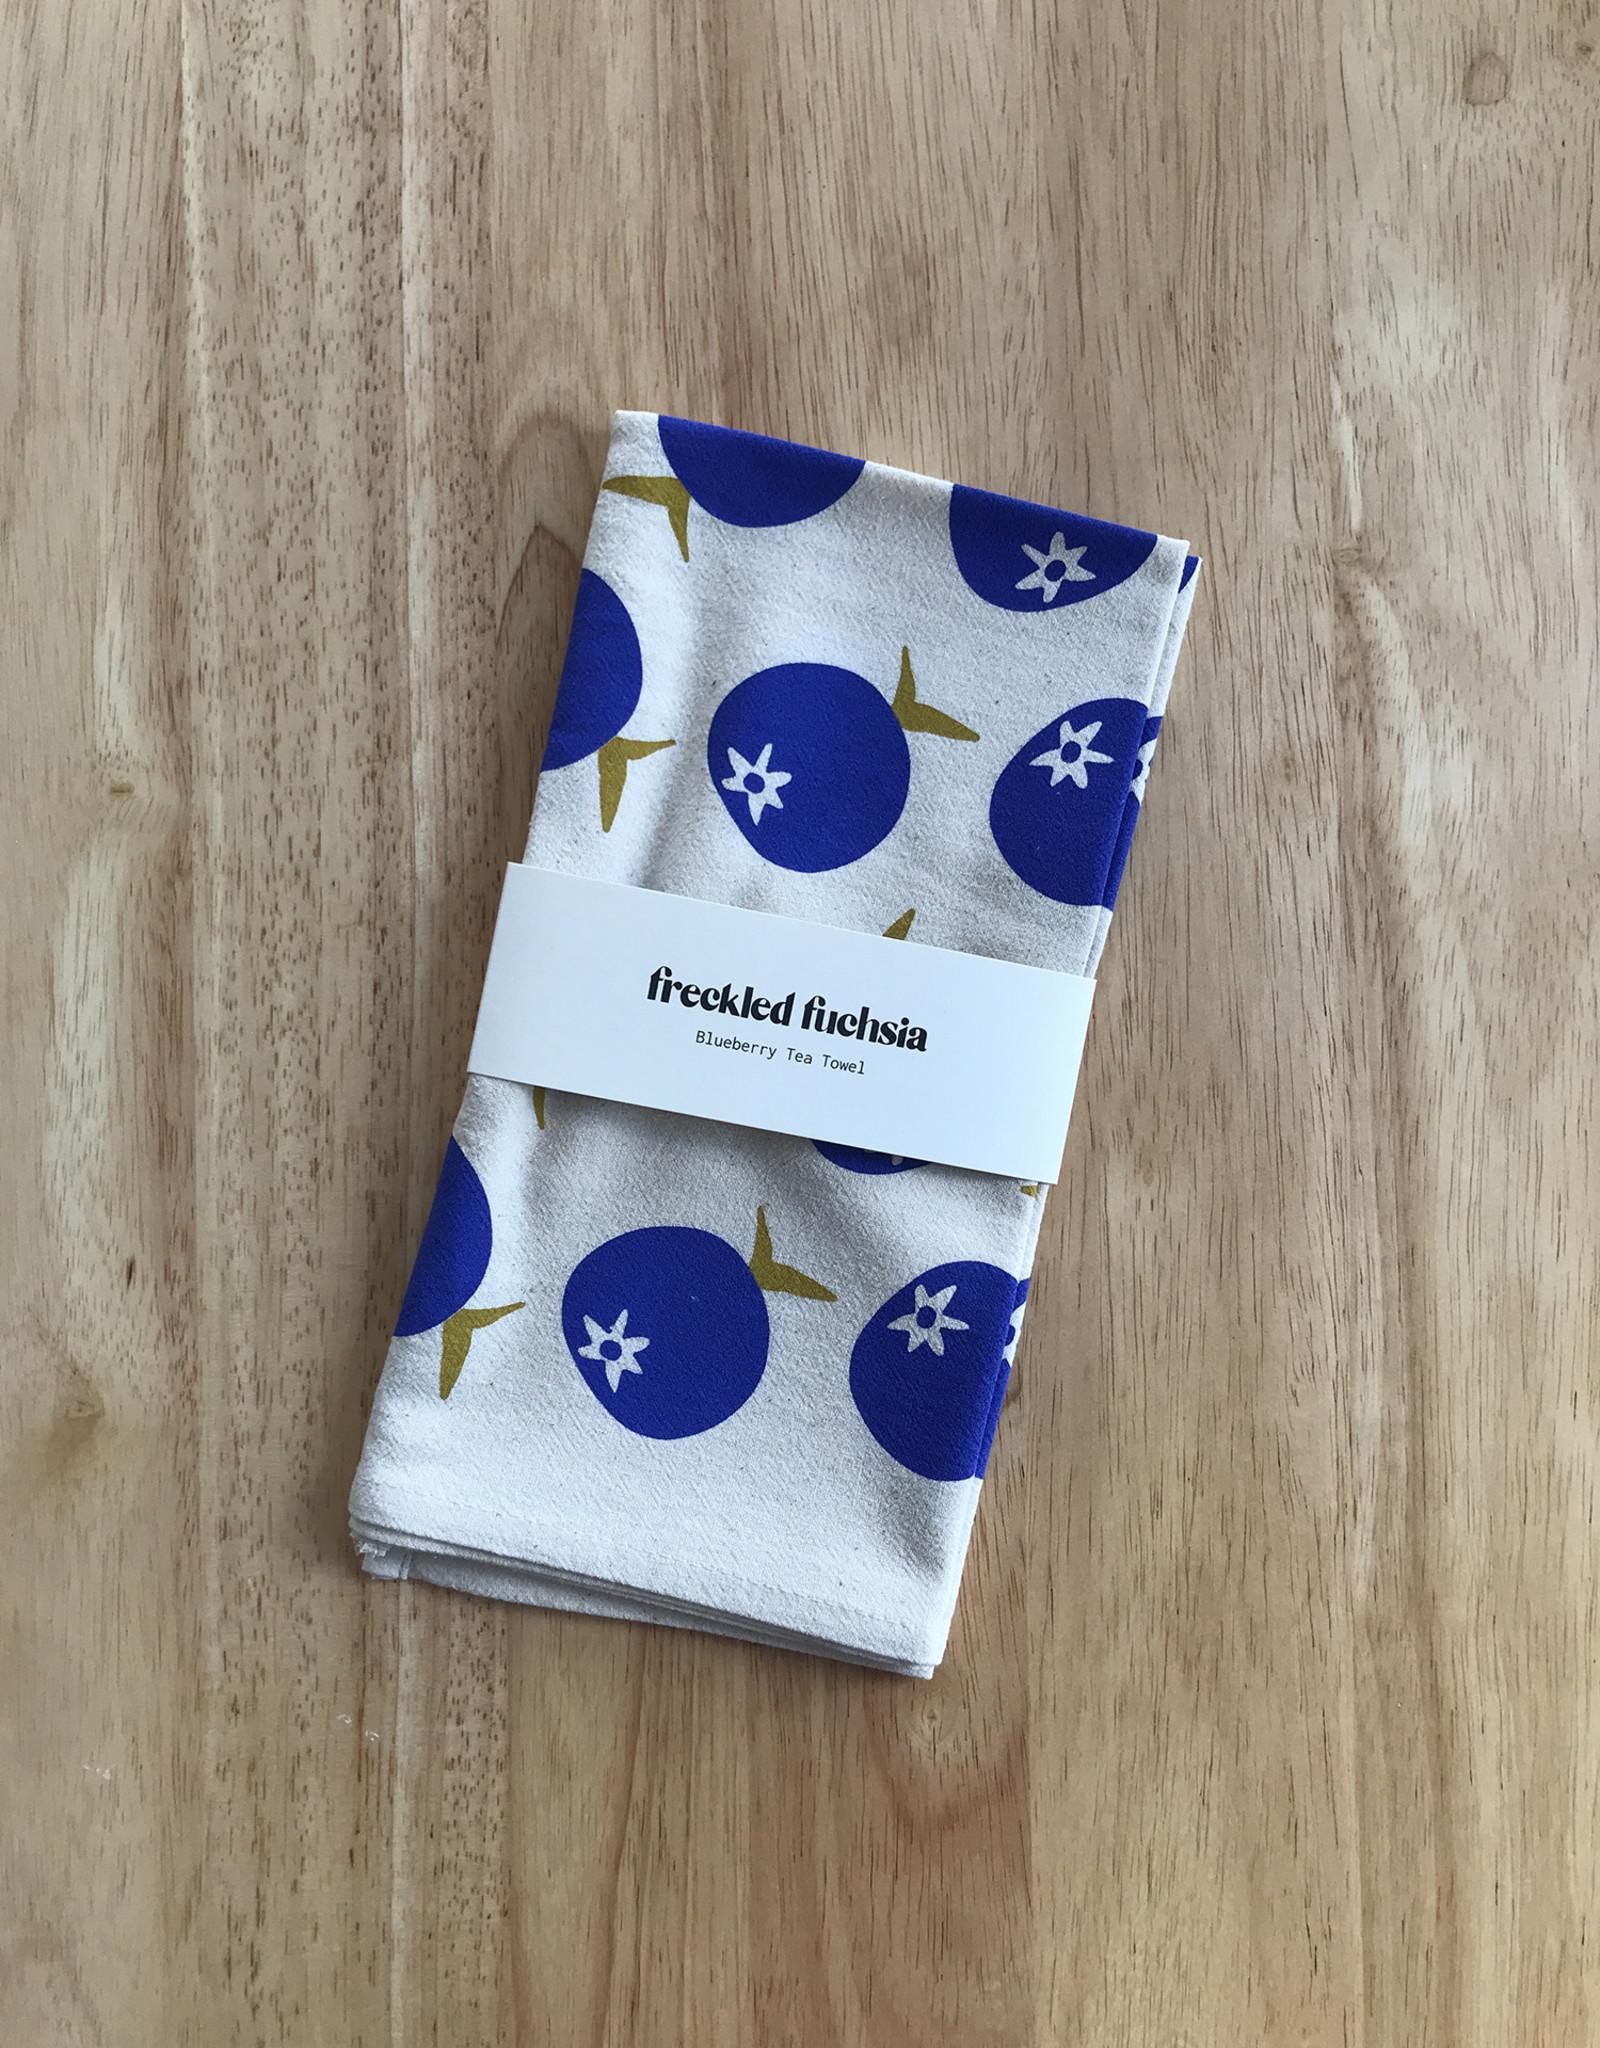 Freckled Fuchsia Tea Towels